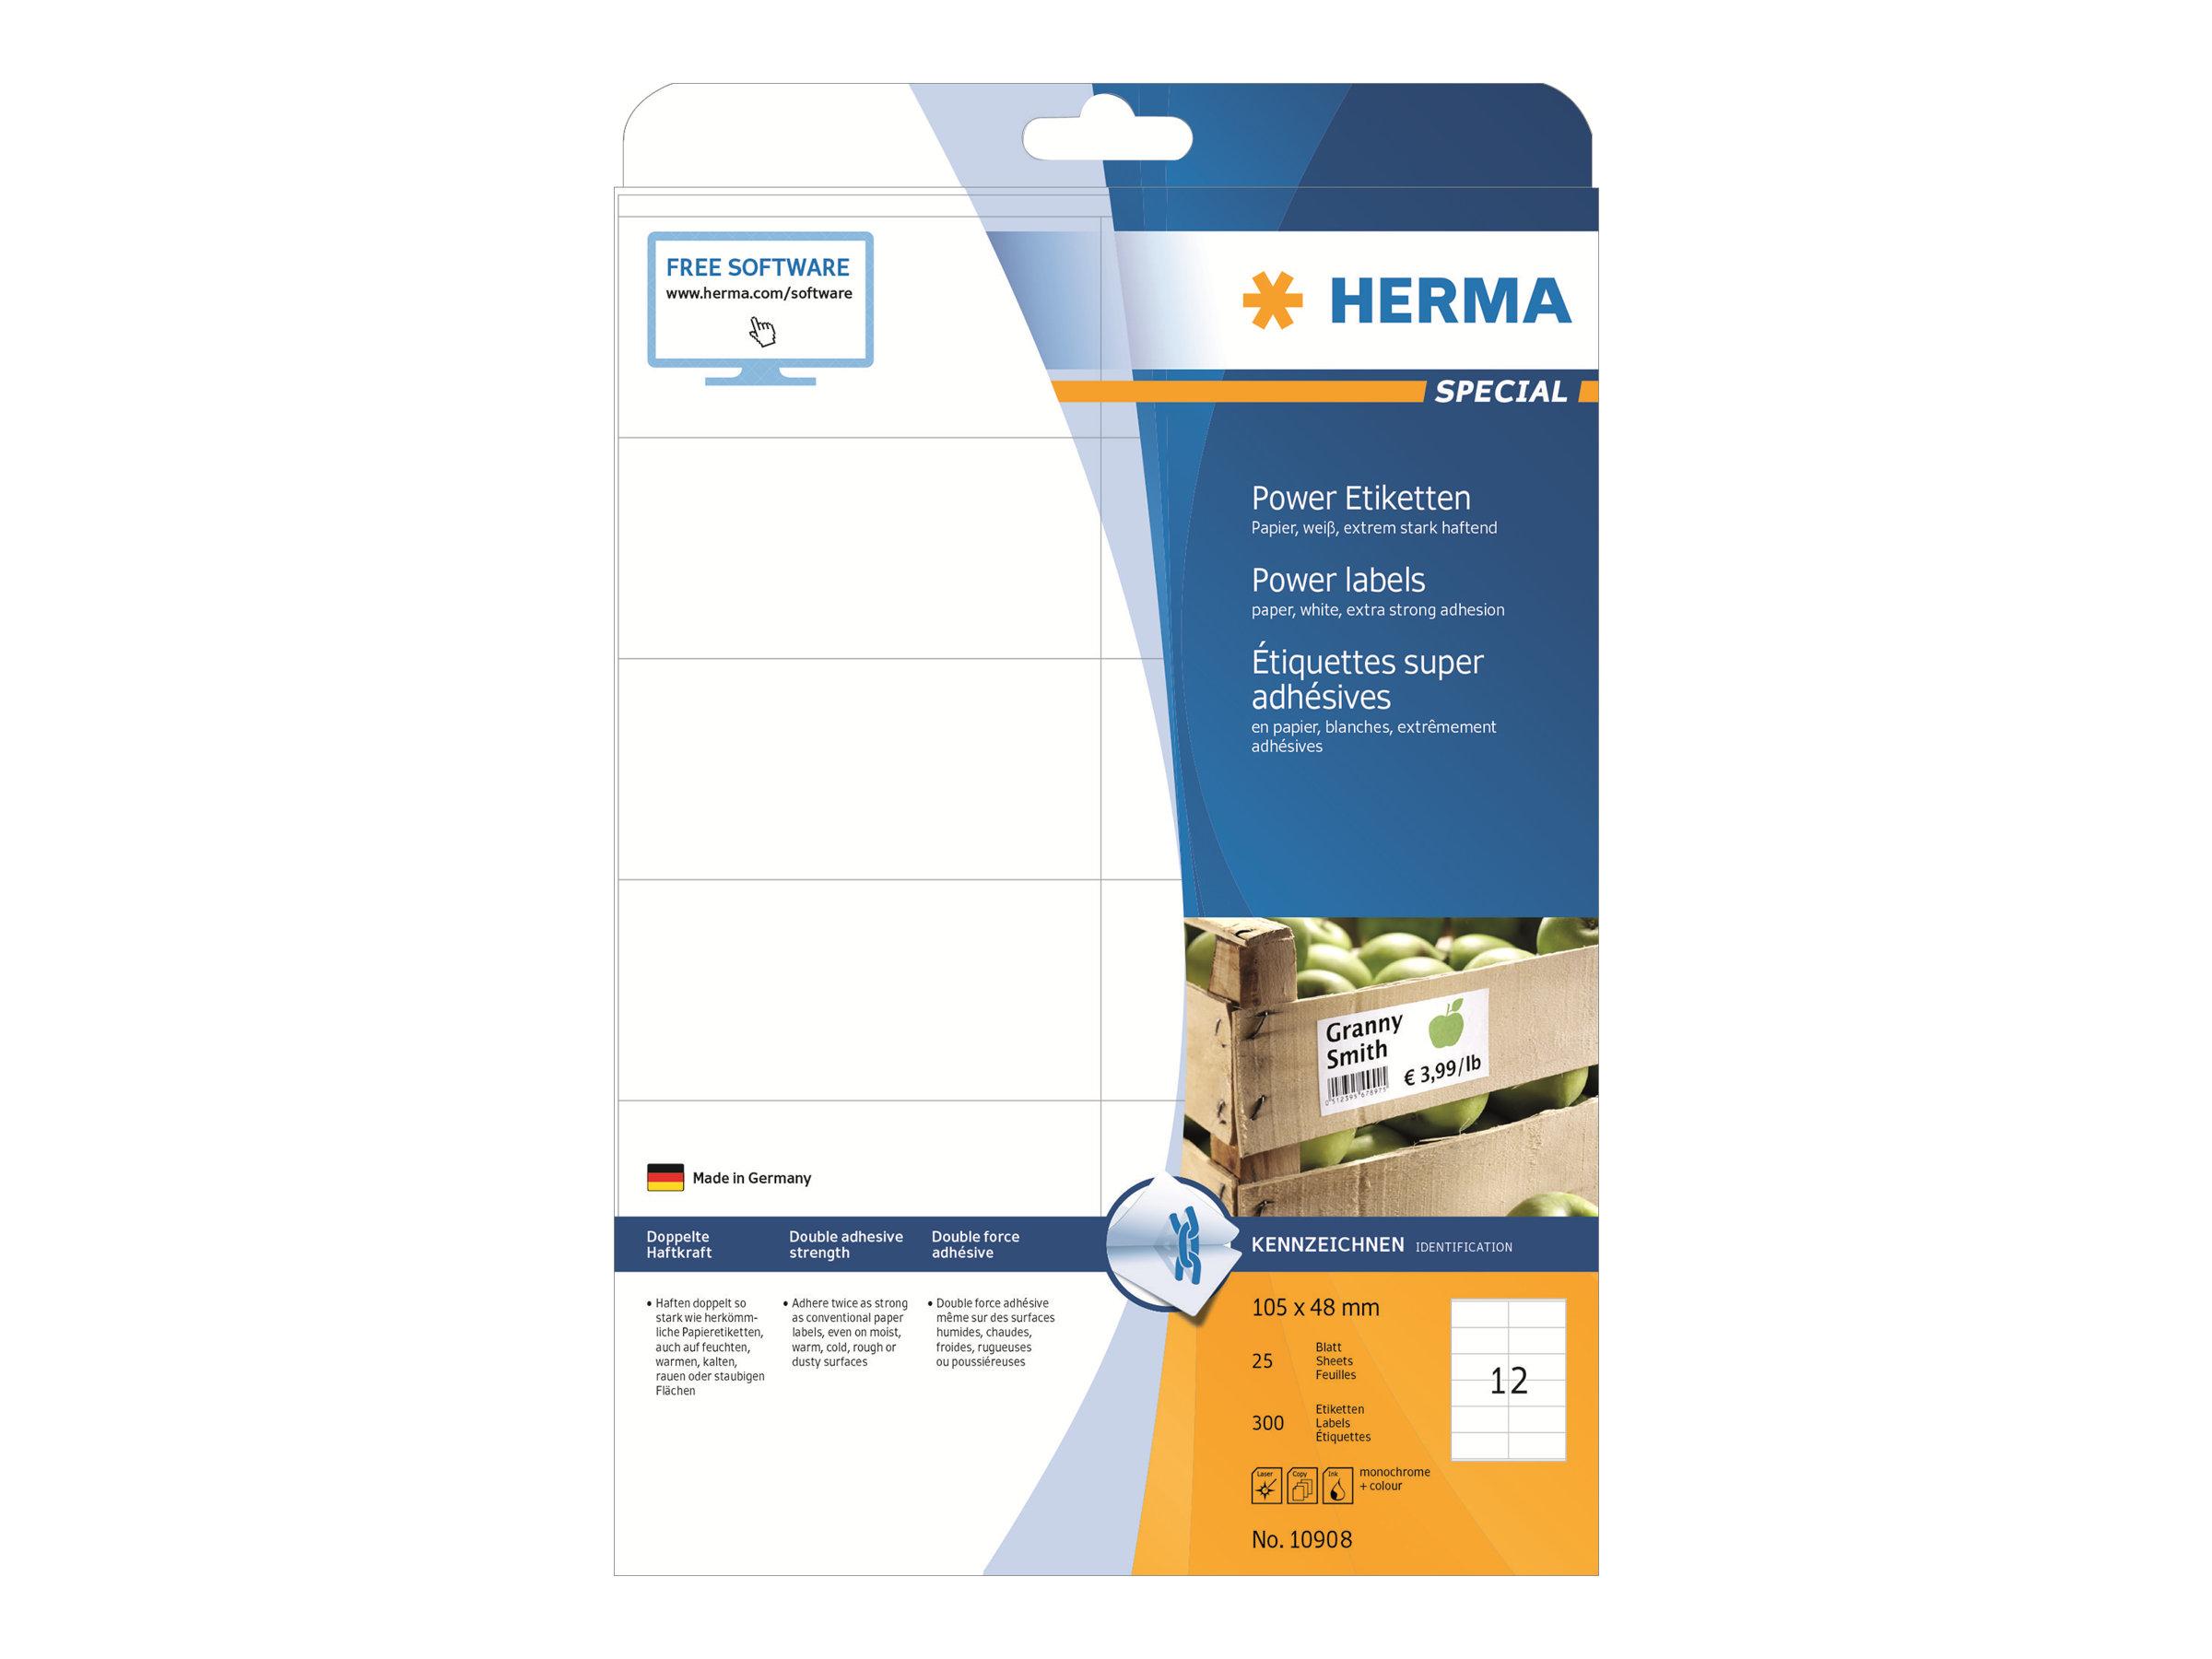 HERMA Special - Papier - matt - extra stark selbstklebend - weiß - 105 x 48 mm 300 Etikett(en) (25 Bogen x 12)